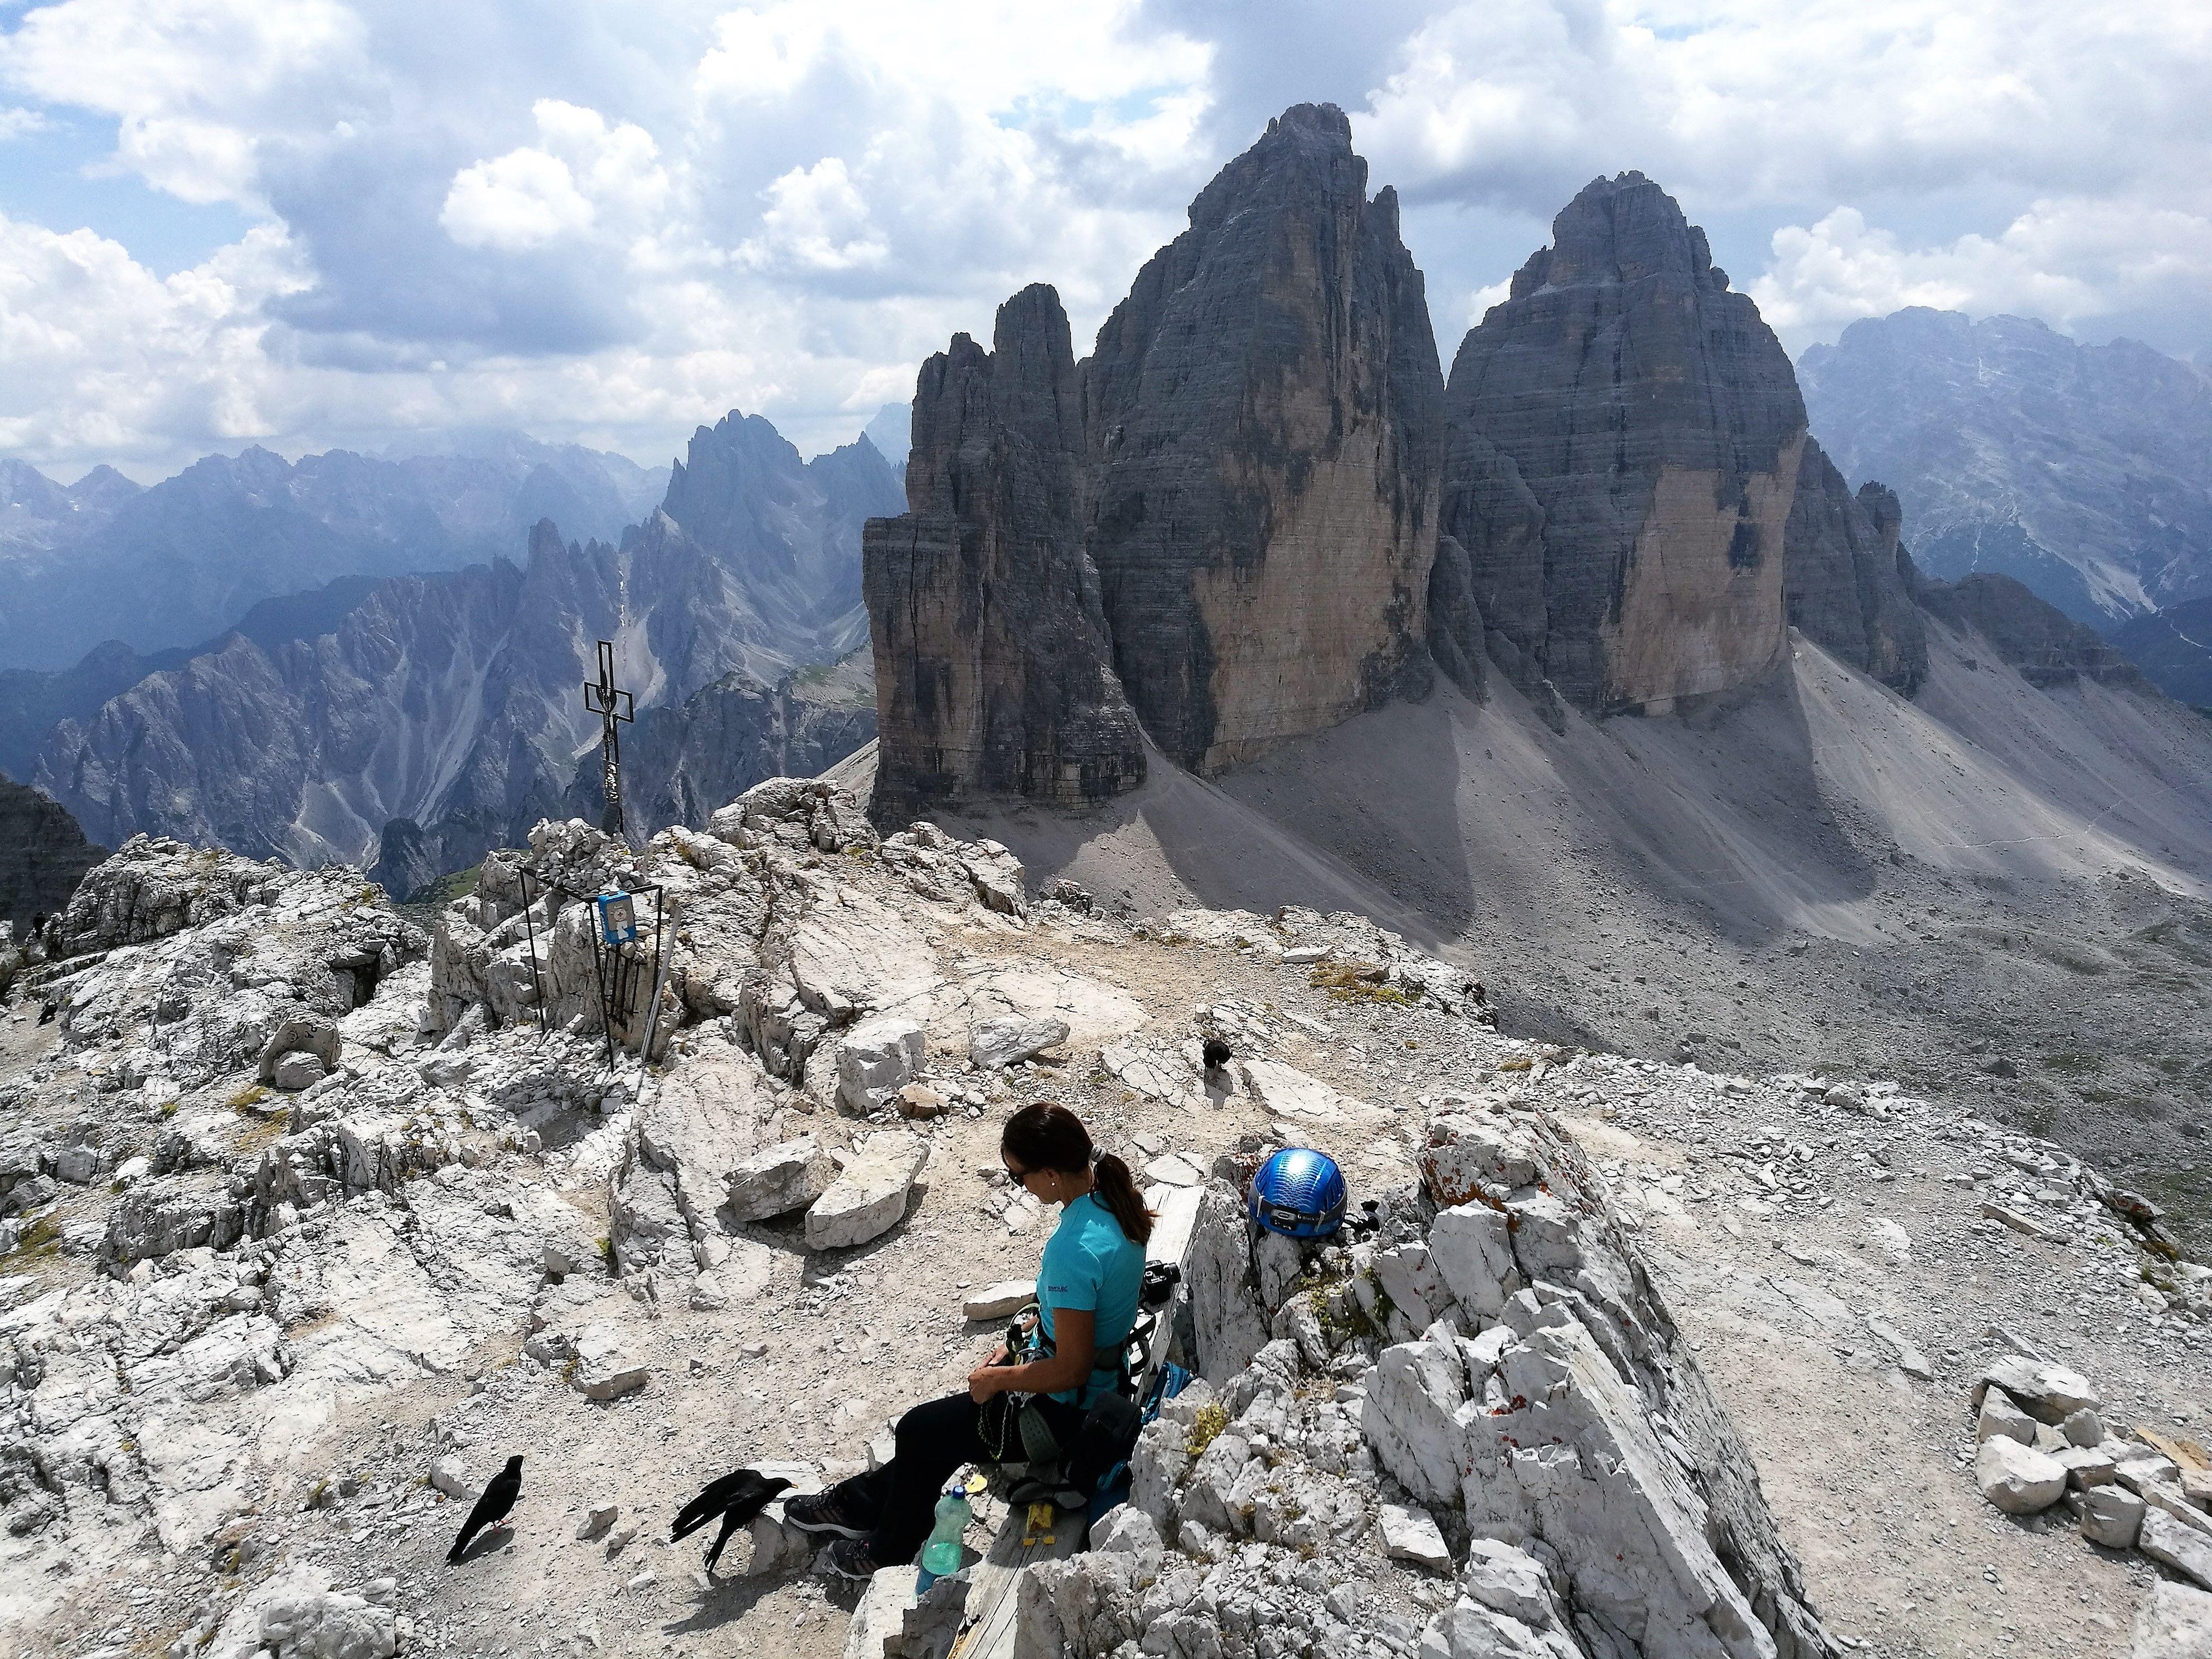 Klettersteig Via Ferrata : Via ferrata marino bianchi alpinschule dreizinnen